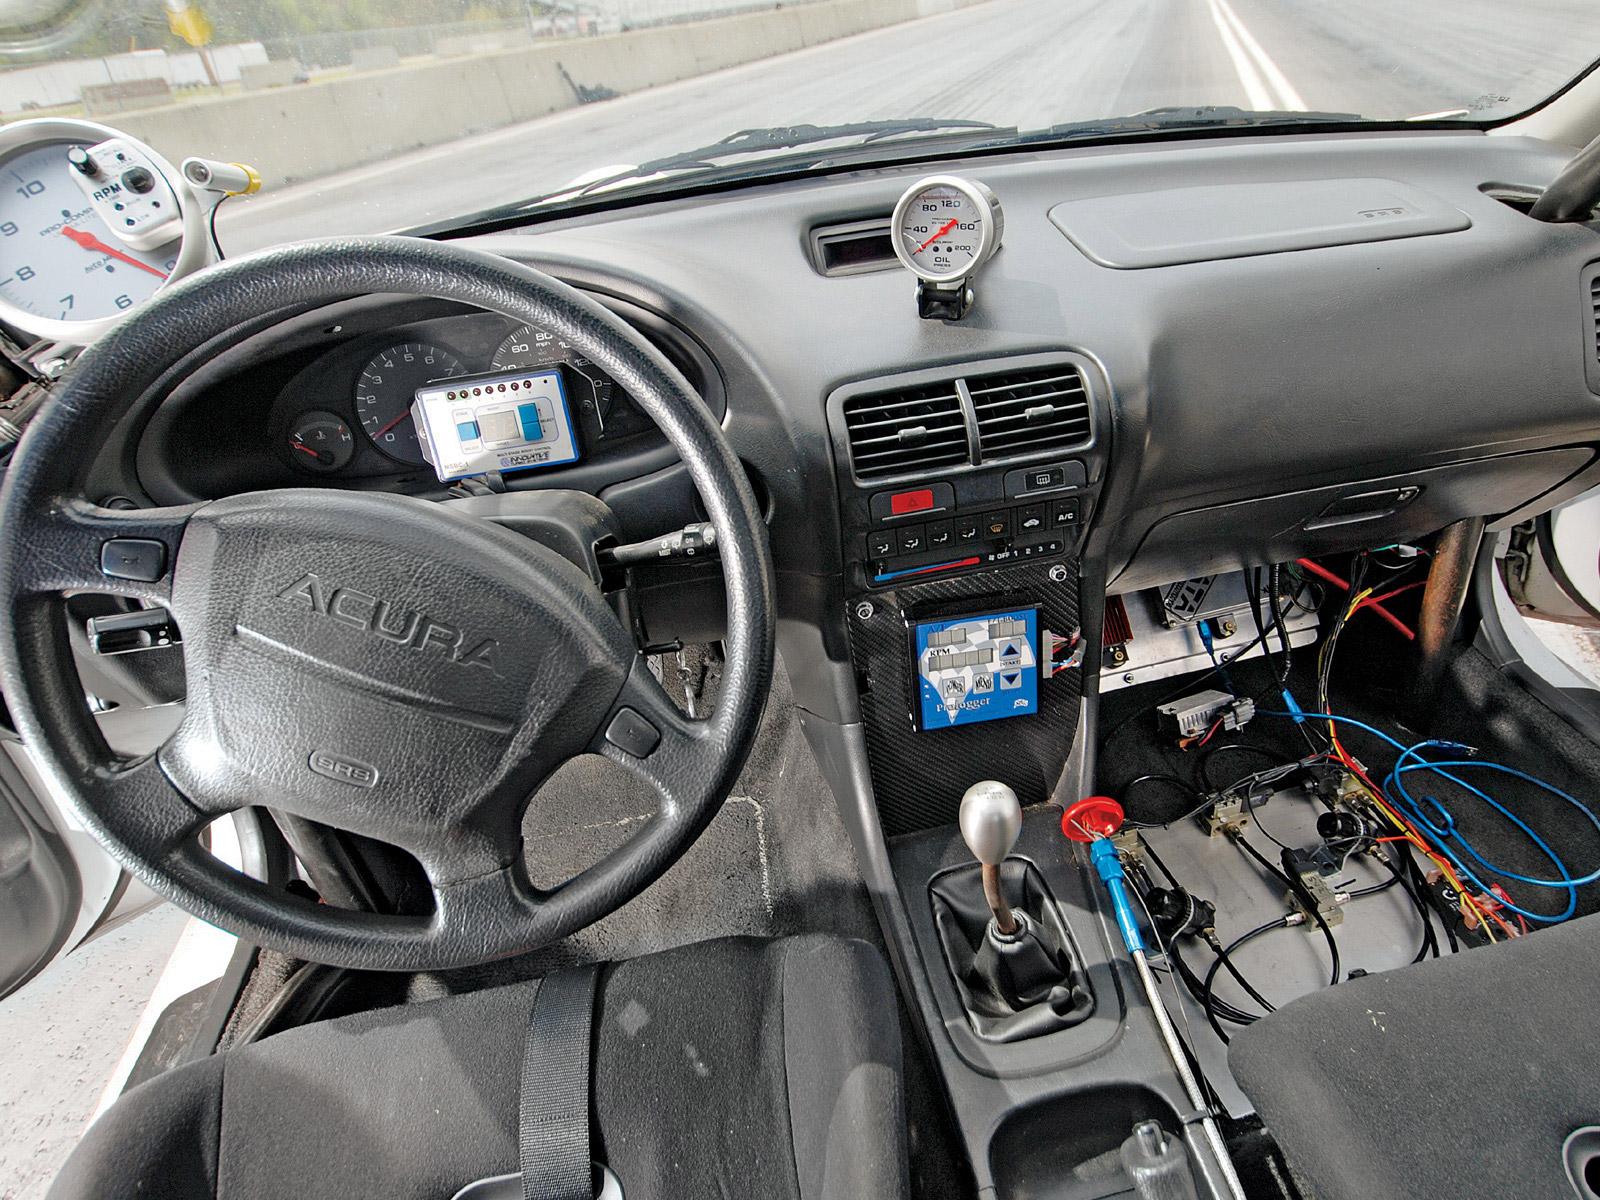 2000 Acura Integra Information And Photos Neo Drive